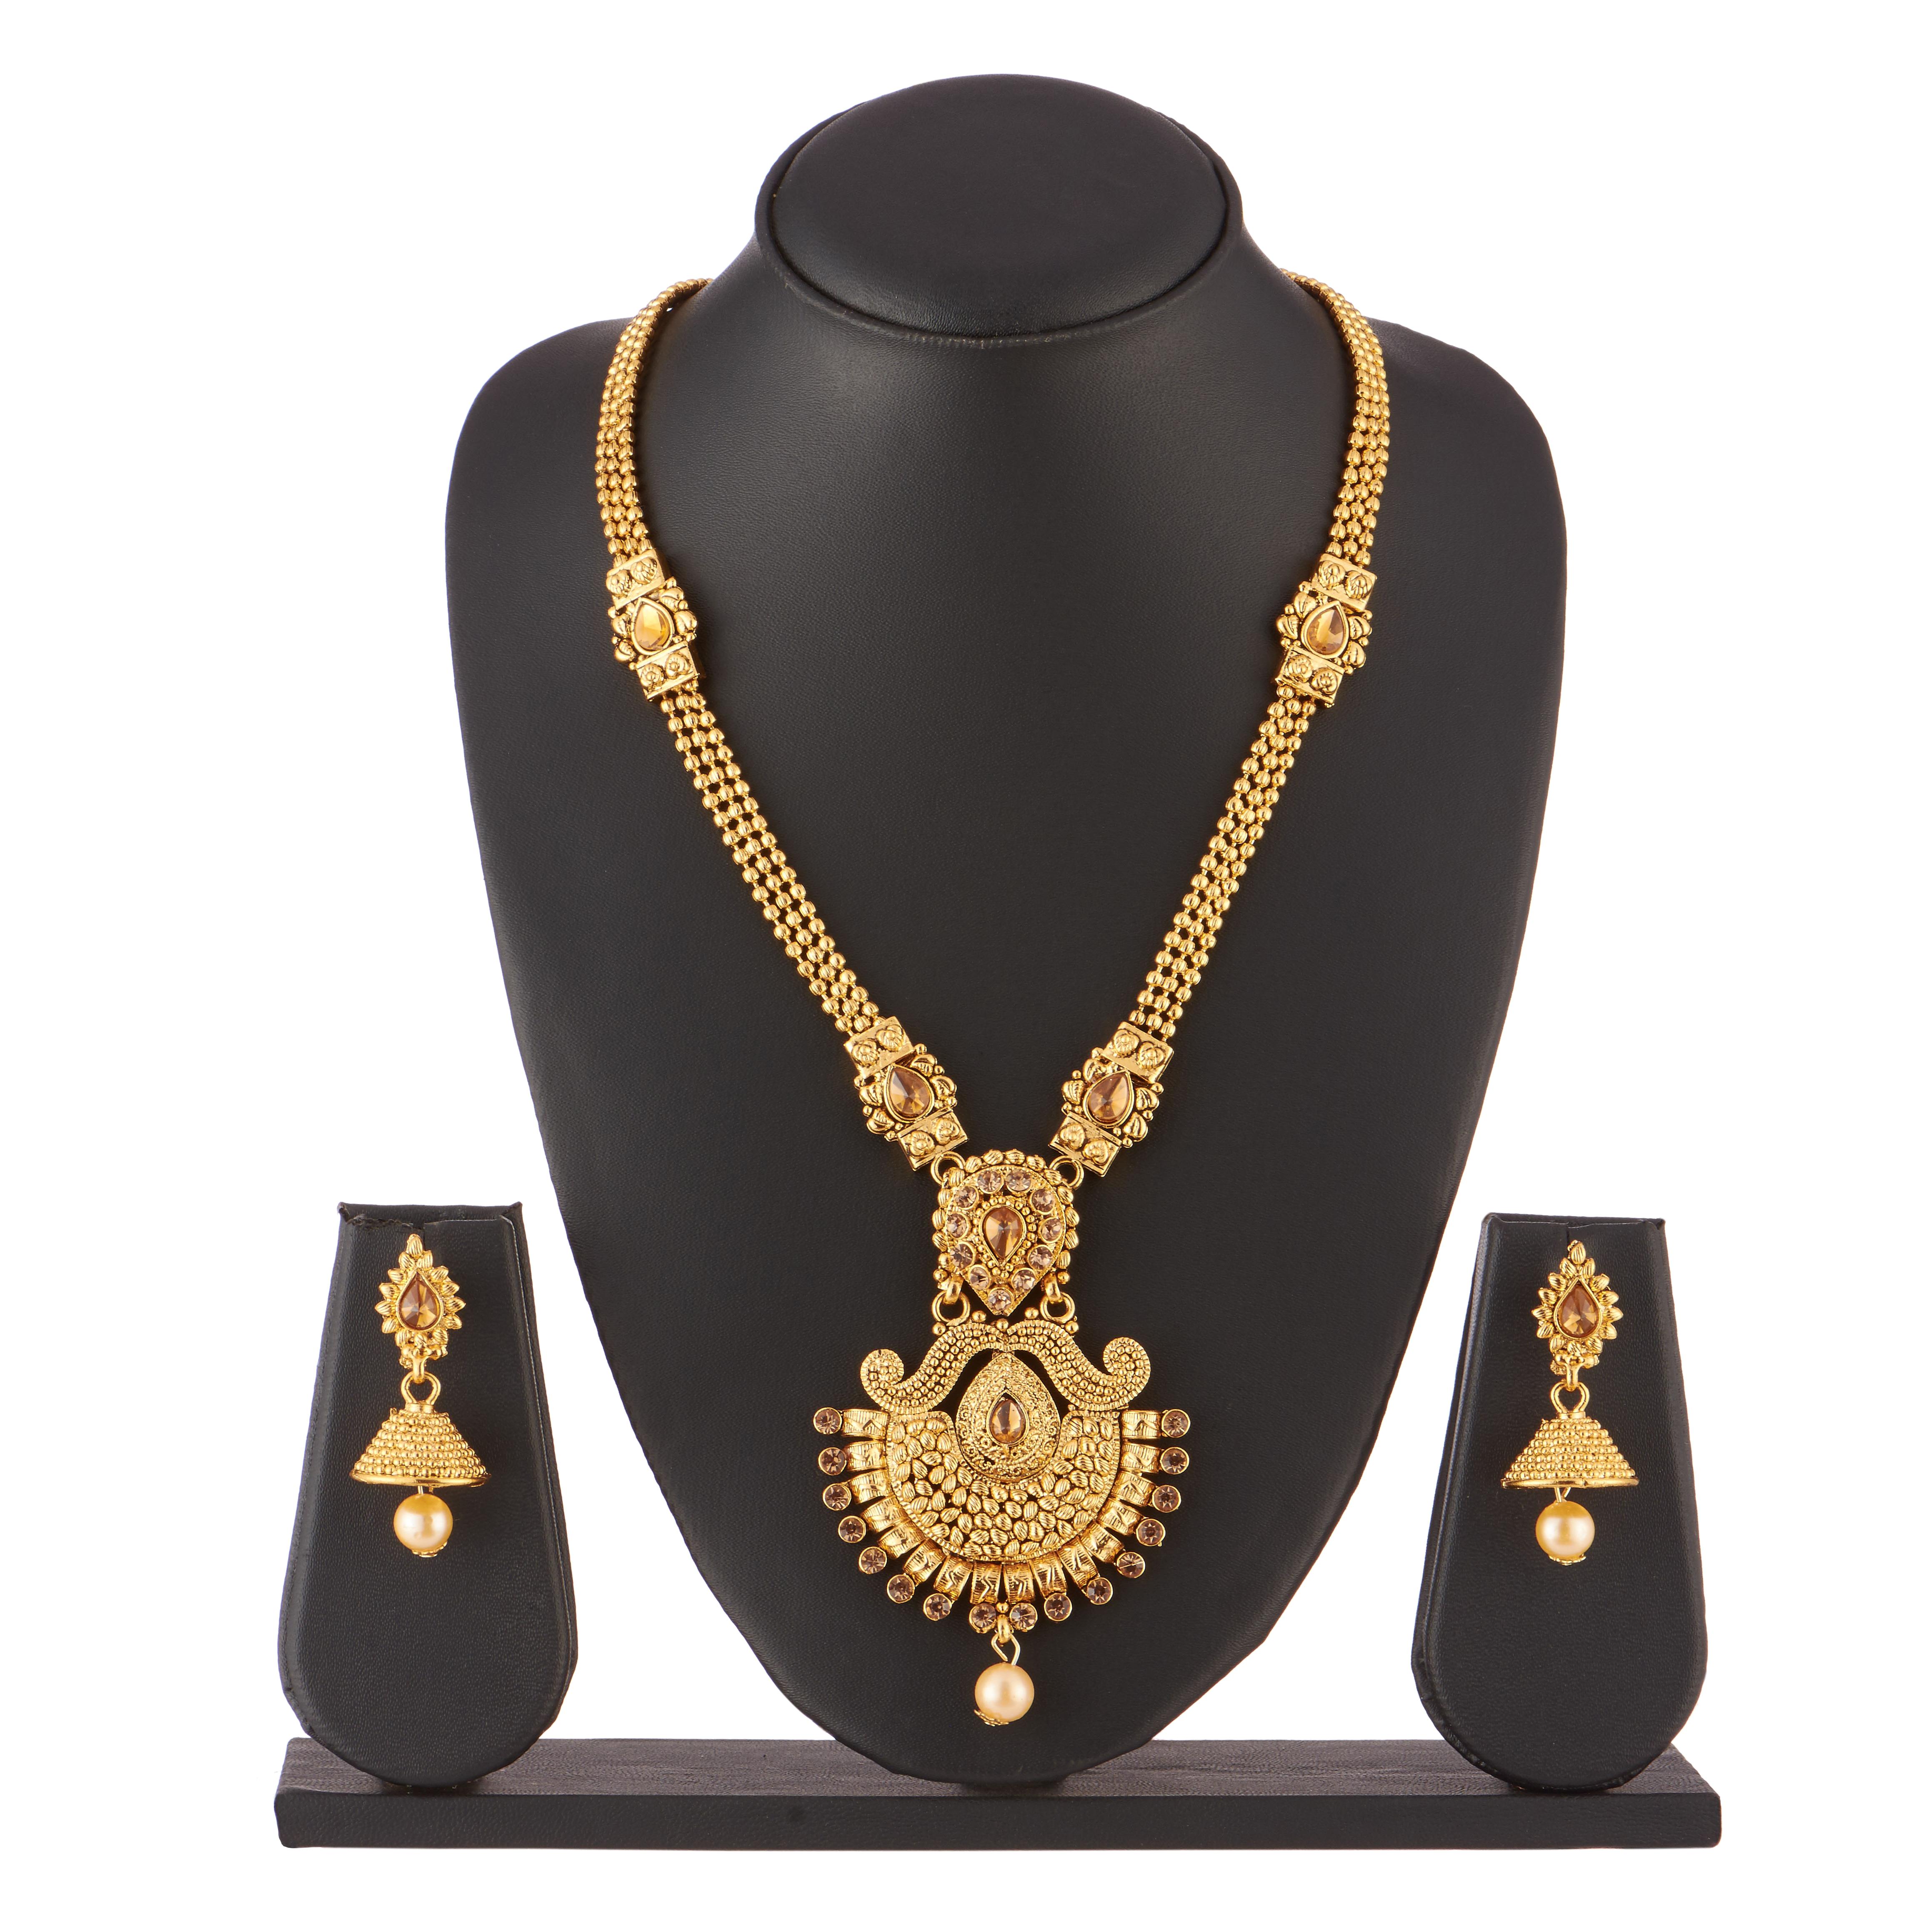 Imitation artificial jewellery gorgeous long haram necklace set